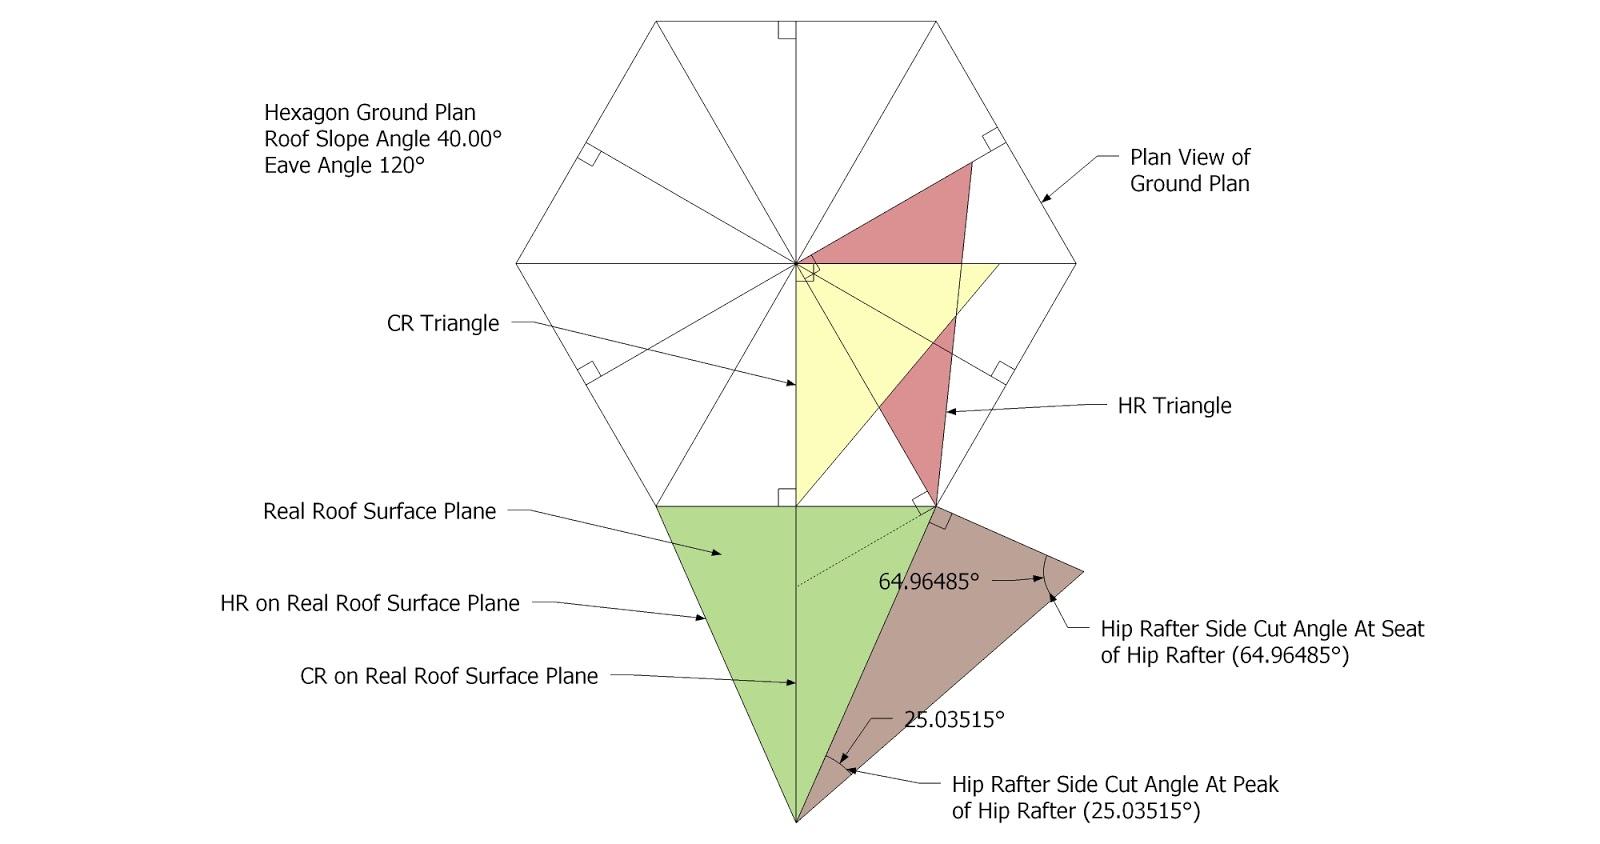 Roof framing geometry stereotomic descriptive geometry for Hexagonal roof framing